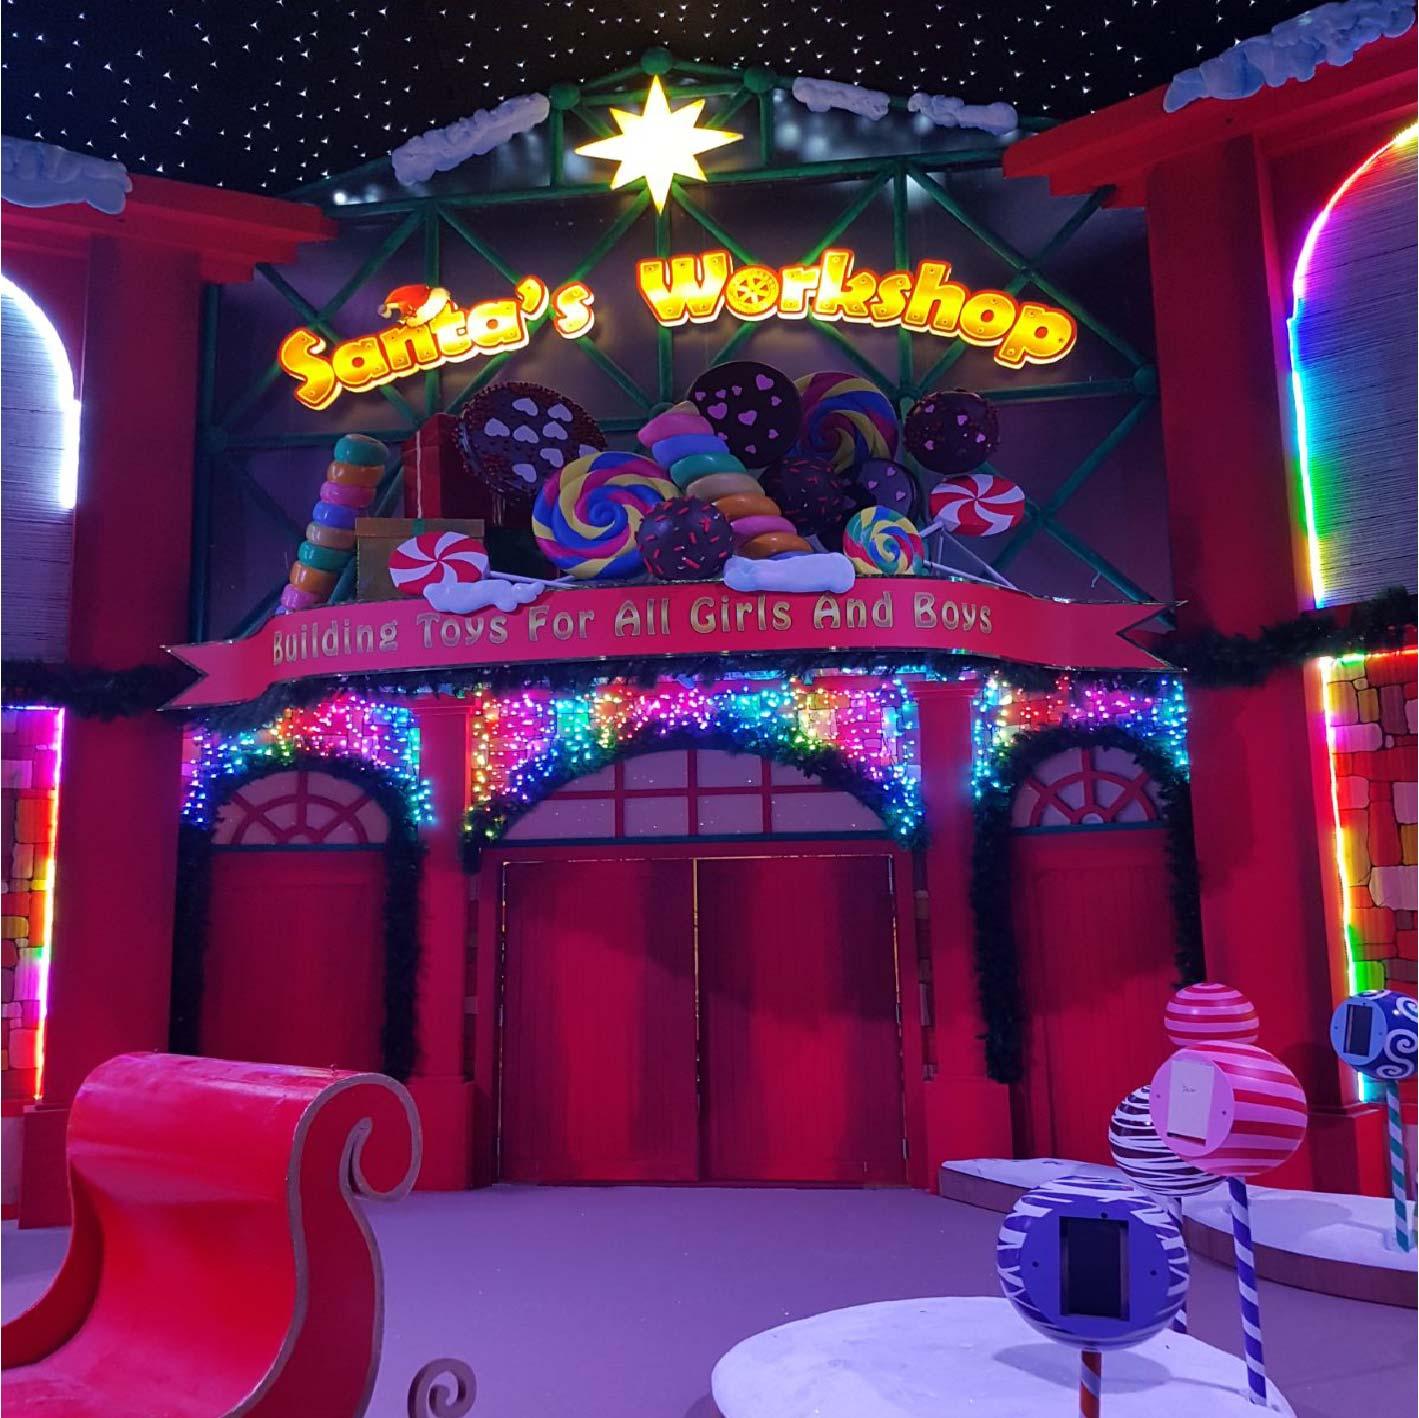 Xmas workshop at Resort World